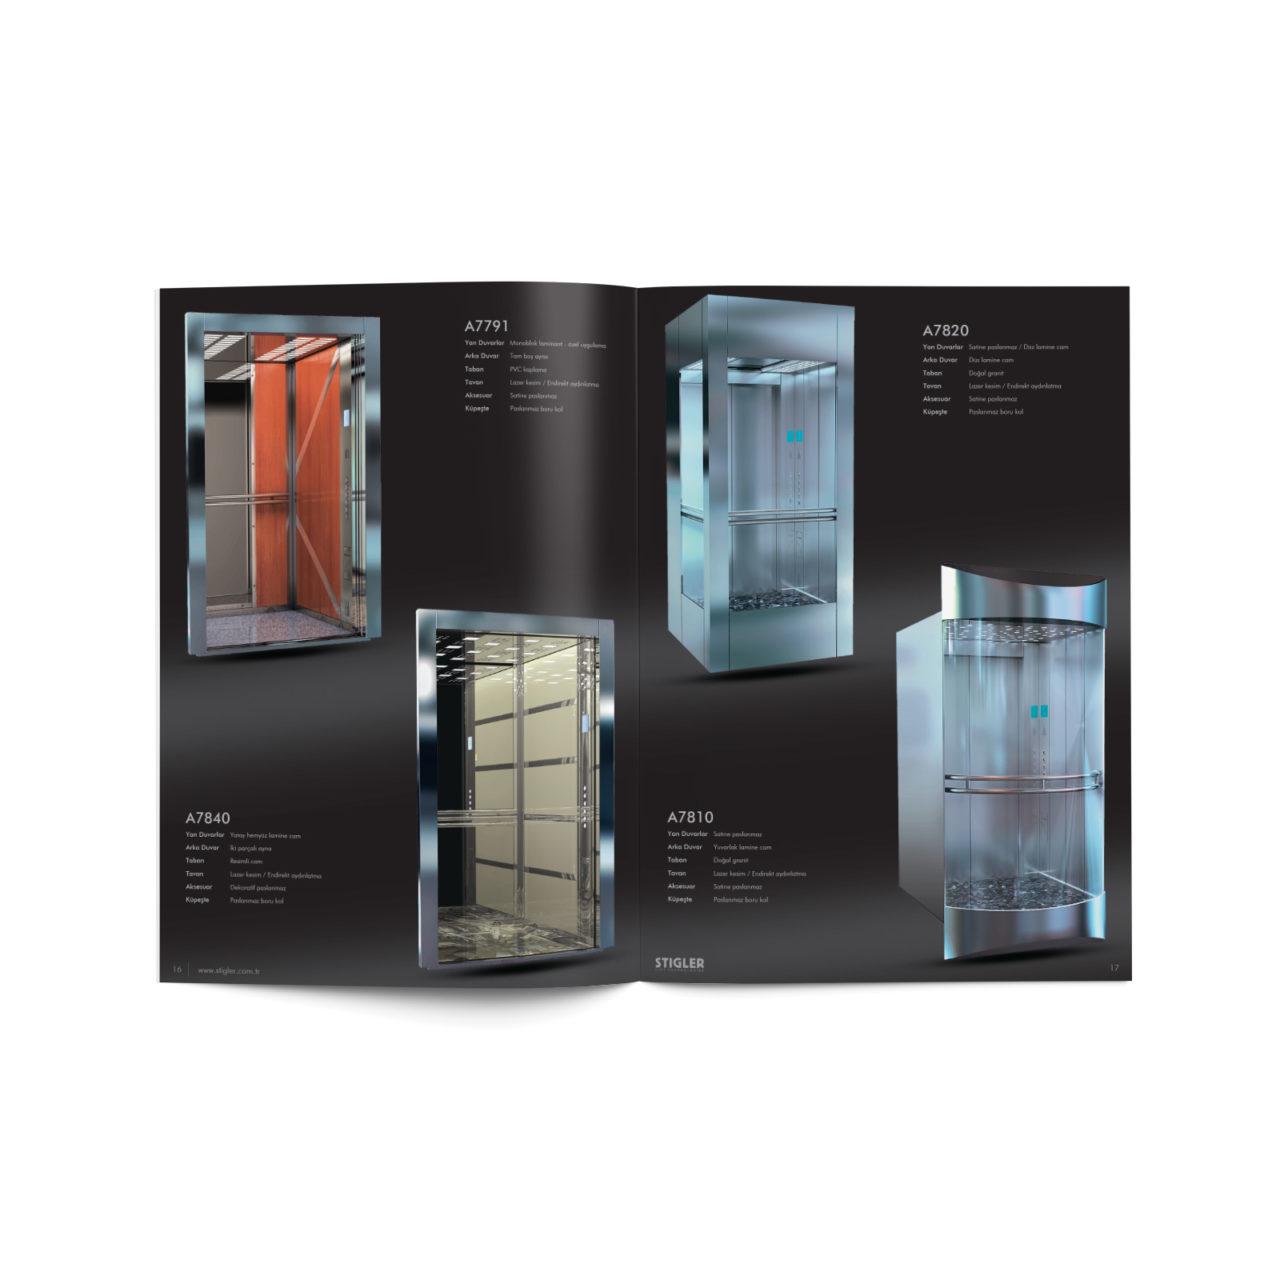 stigler-asansor-katalogu-3